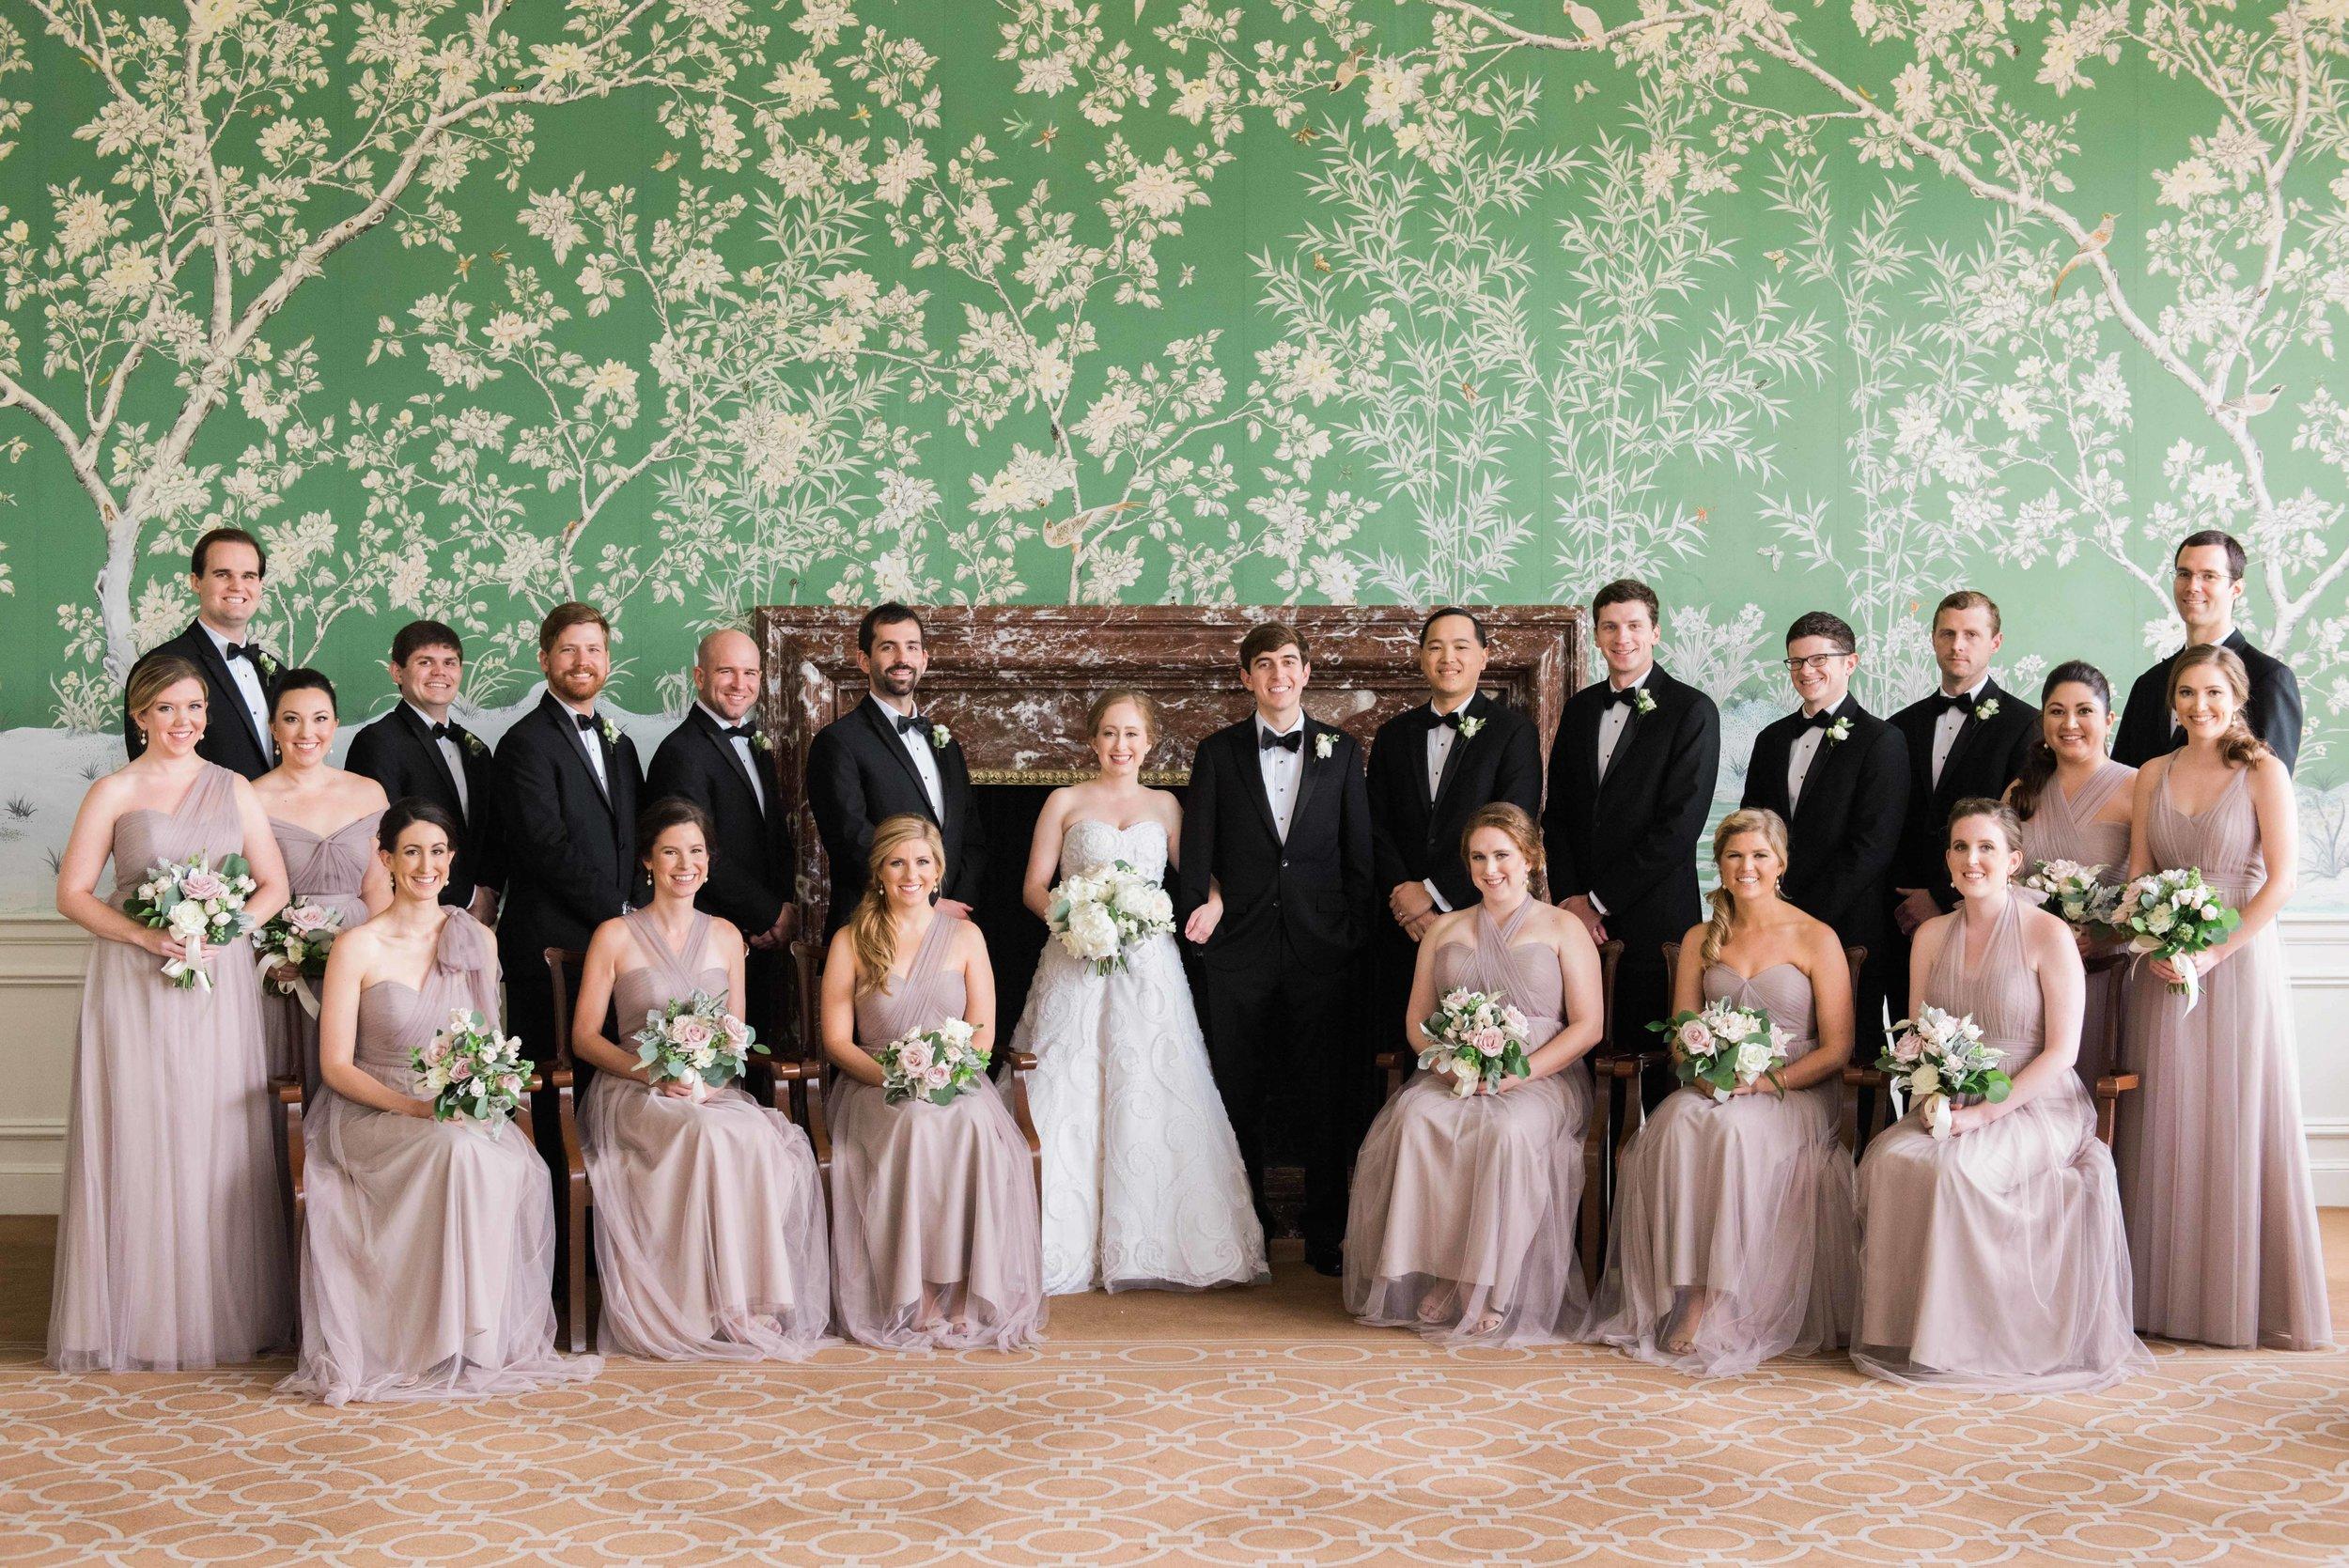 Fine-Art-Film-Houston-Wedding-Photographer-Best-Top-Luxury-Texas-Austin-Dallas-Destination-Dana-Fernandez-Photography-River-Oaks-Country-Club-South-Main-Baptist-Ceremony-Reception-Wedding-24.jpg